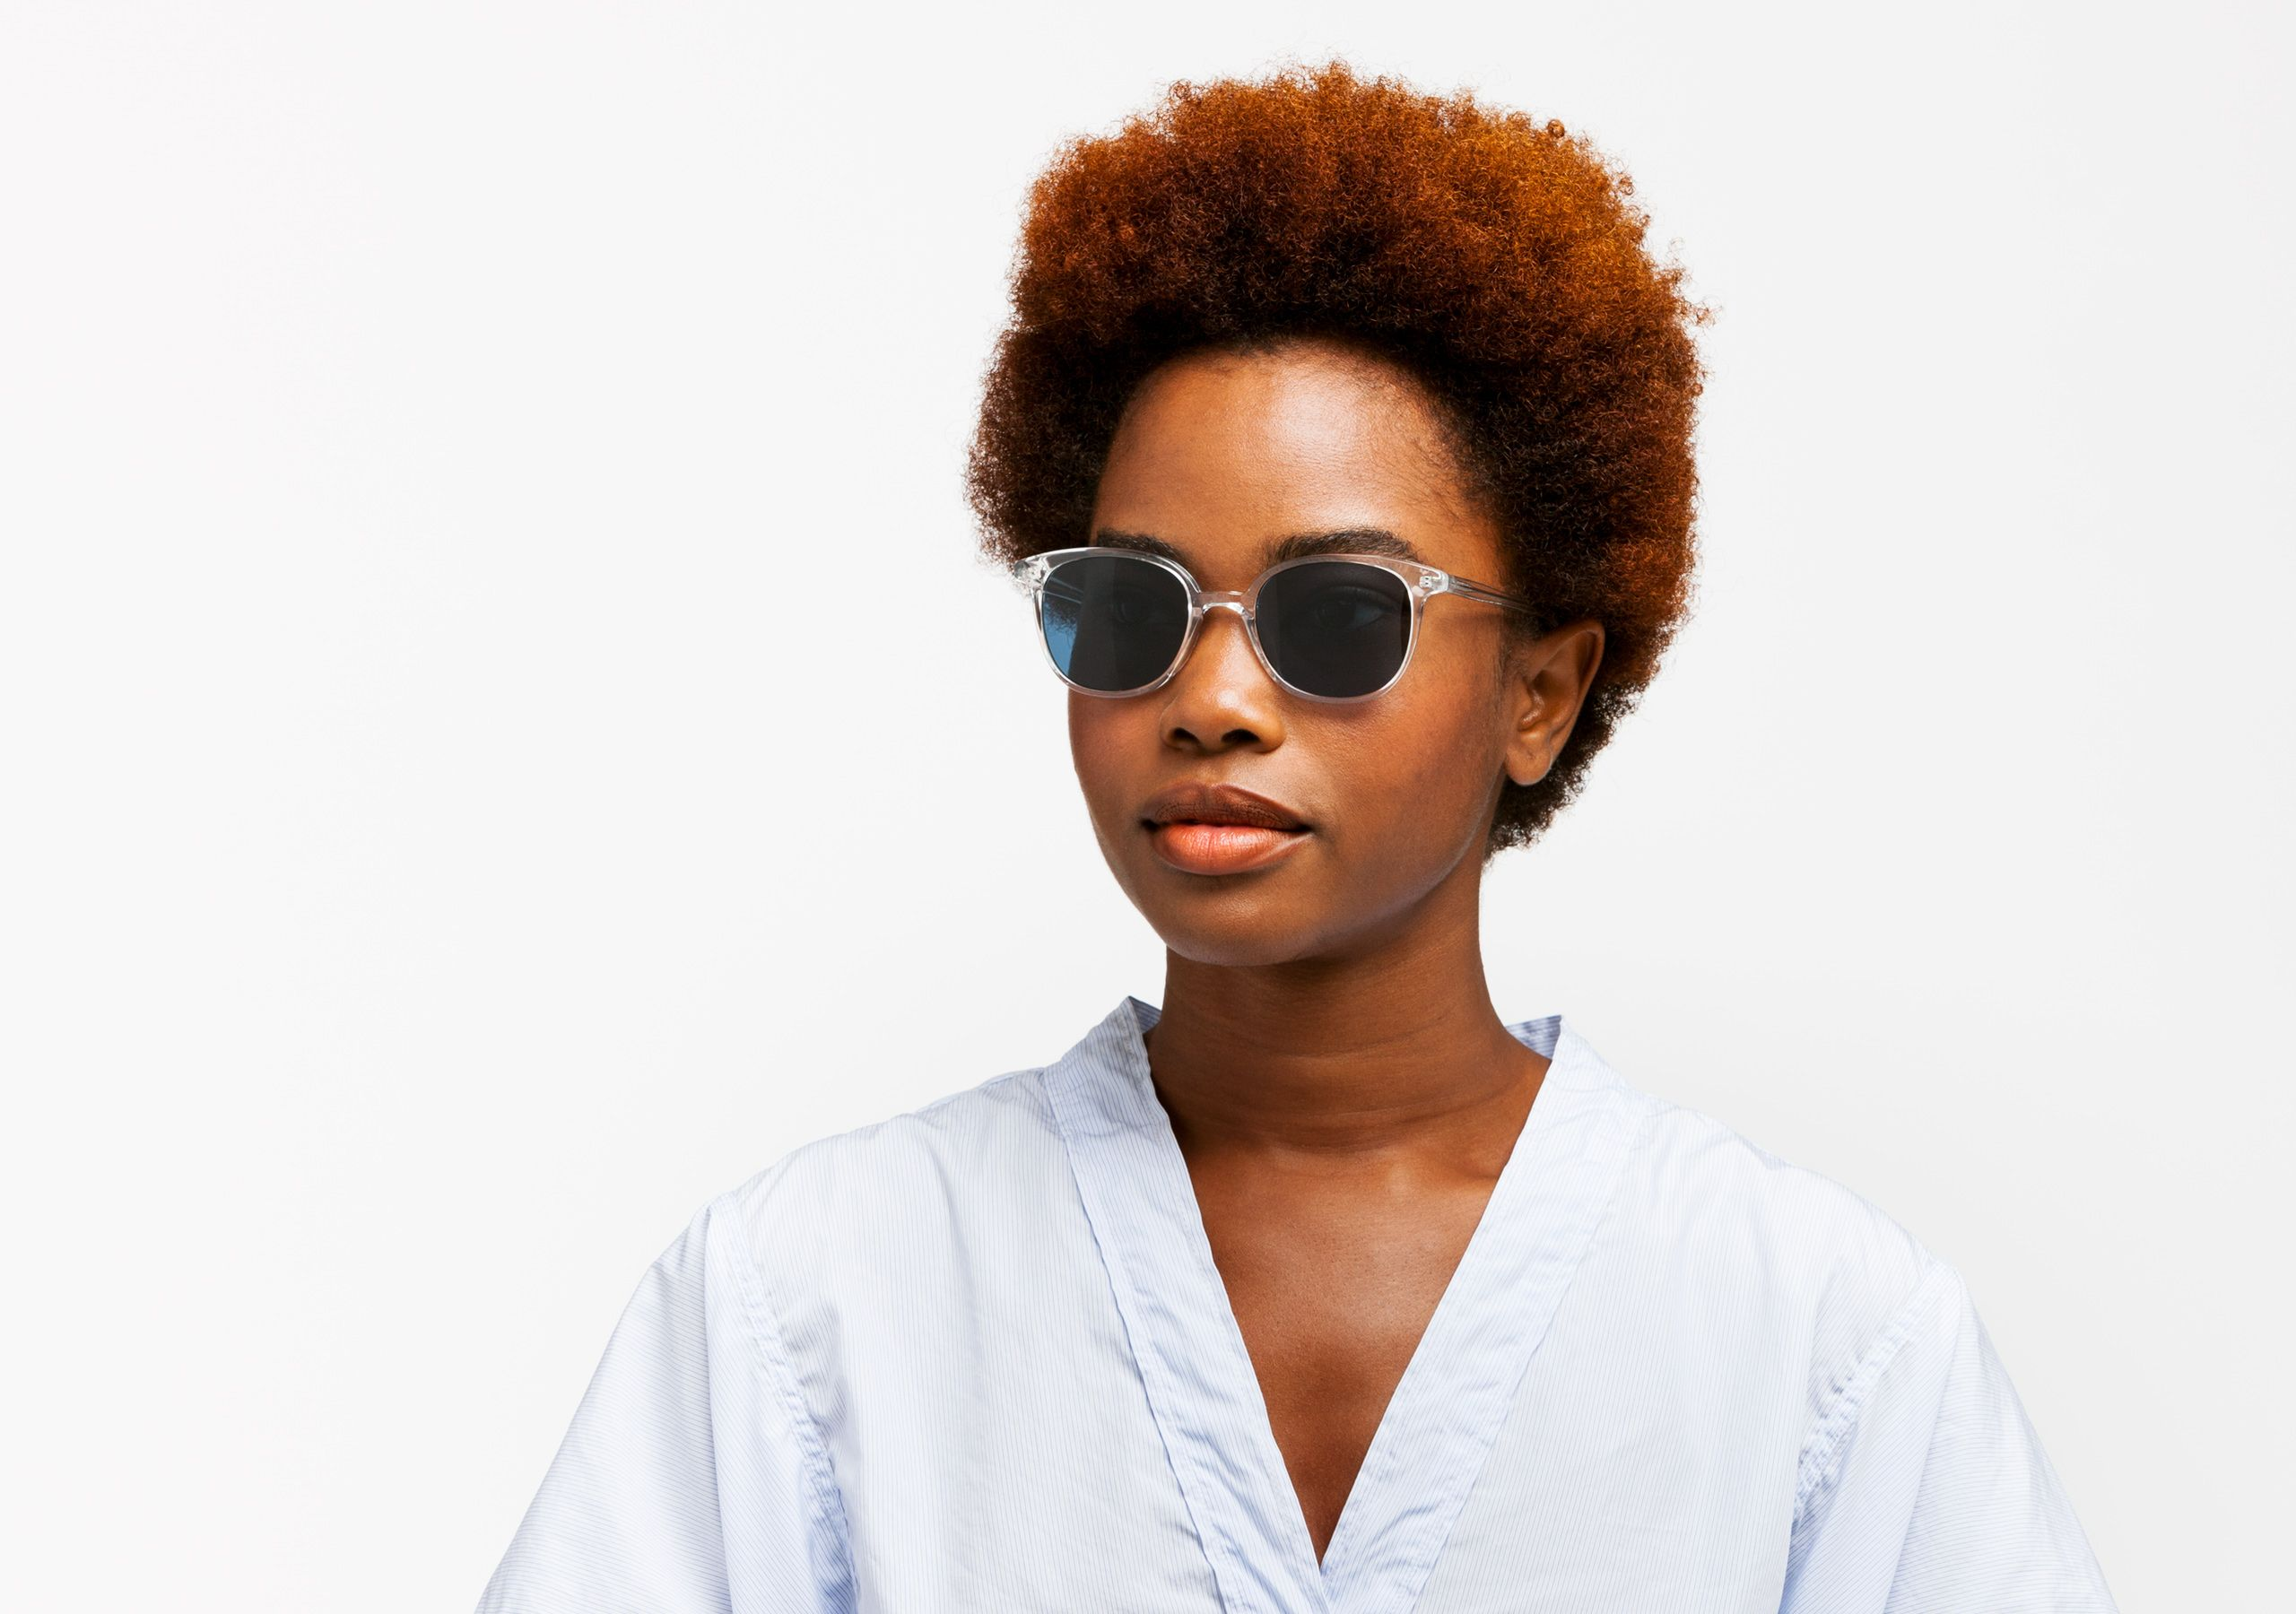 sunglasses_woman_dahl_cristal_Andrea_310.jpg